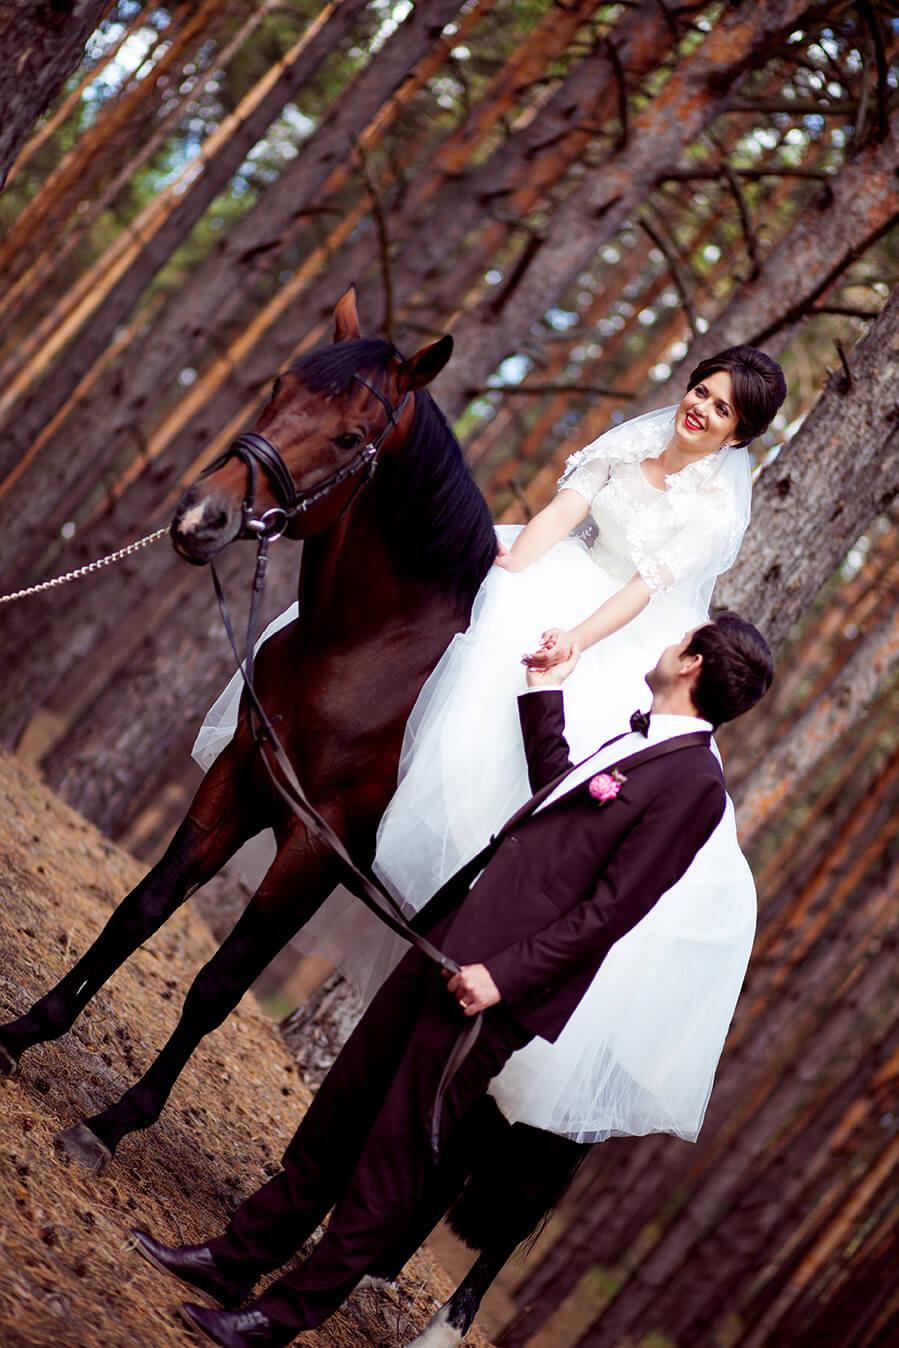 4-svadebnaja-fotosessija-na-konjah-7